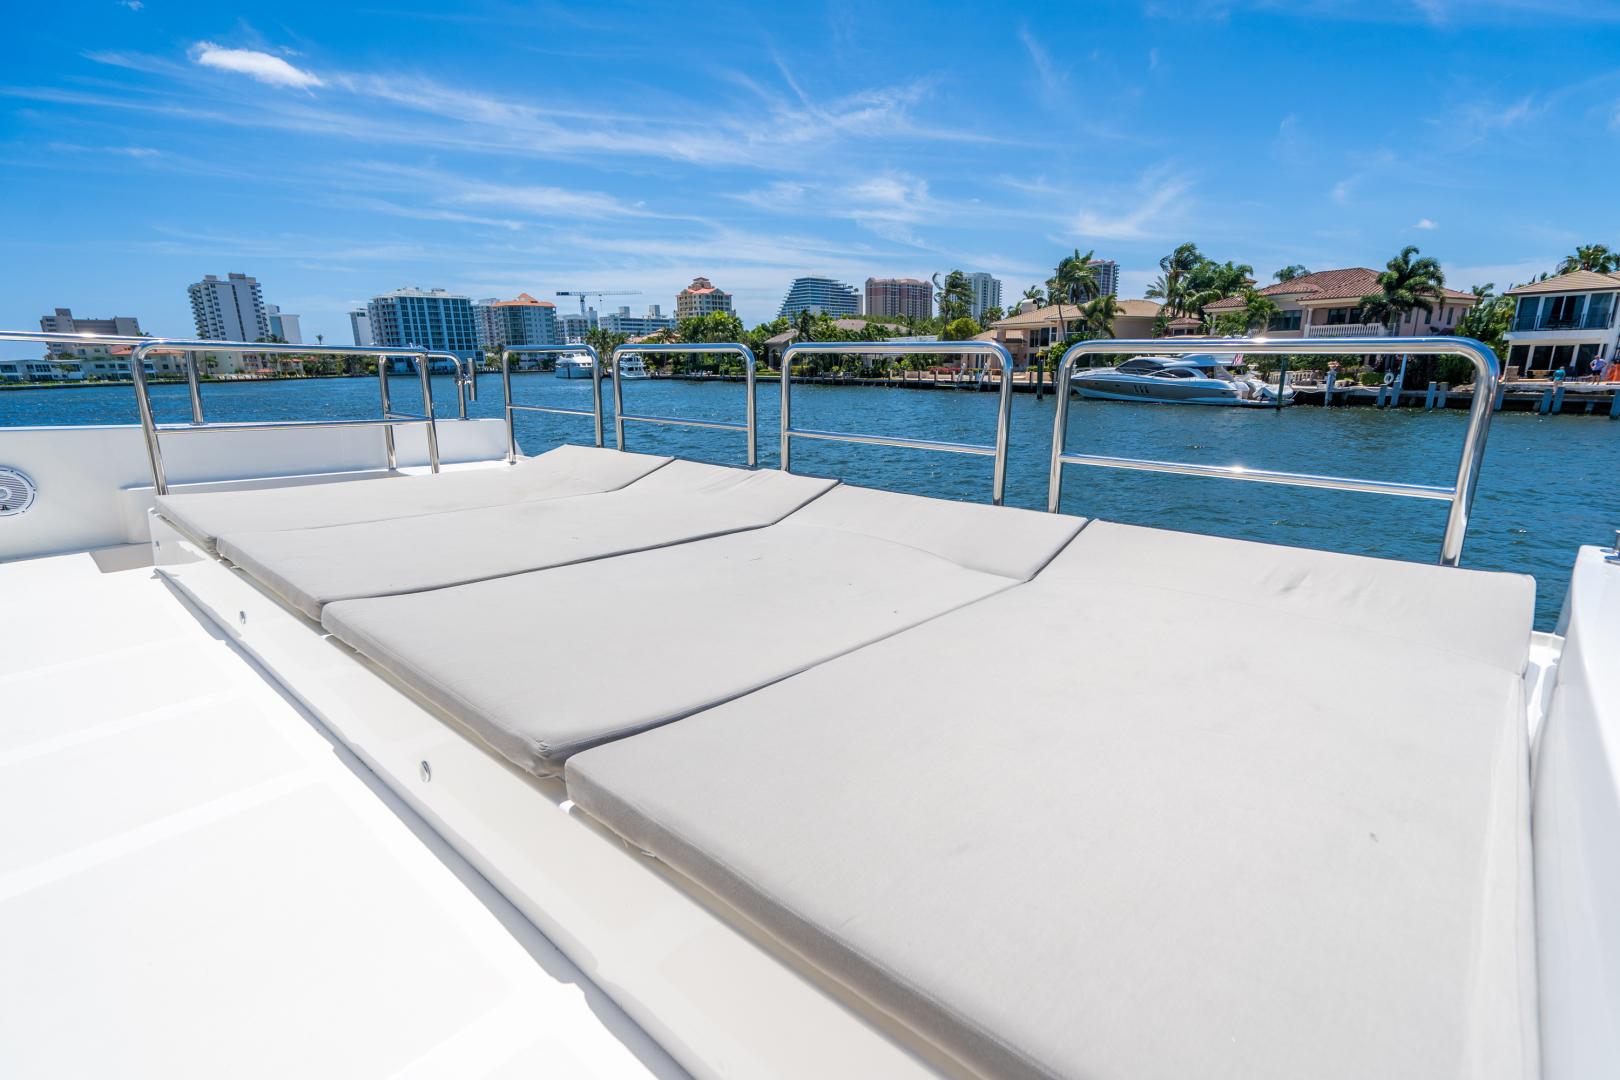 Overblue-58 Power Catamaran 2017-Techuila Ft. Lauderdale-Florida-United States-2017 Overblue 58 Powercat-1401254   Thumbnail